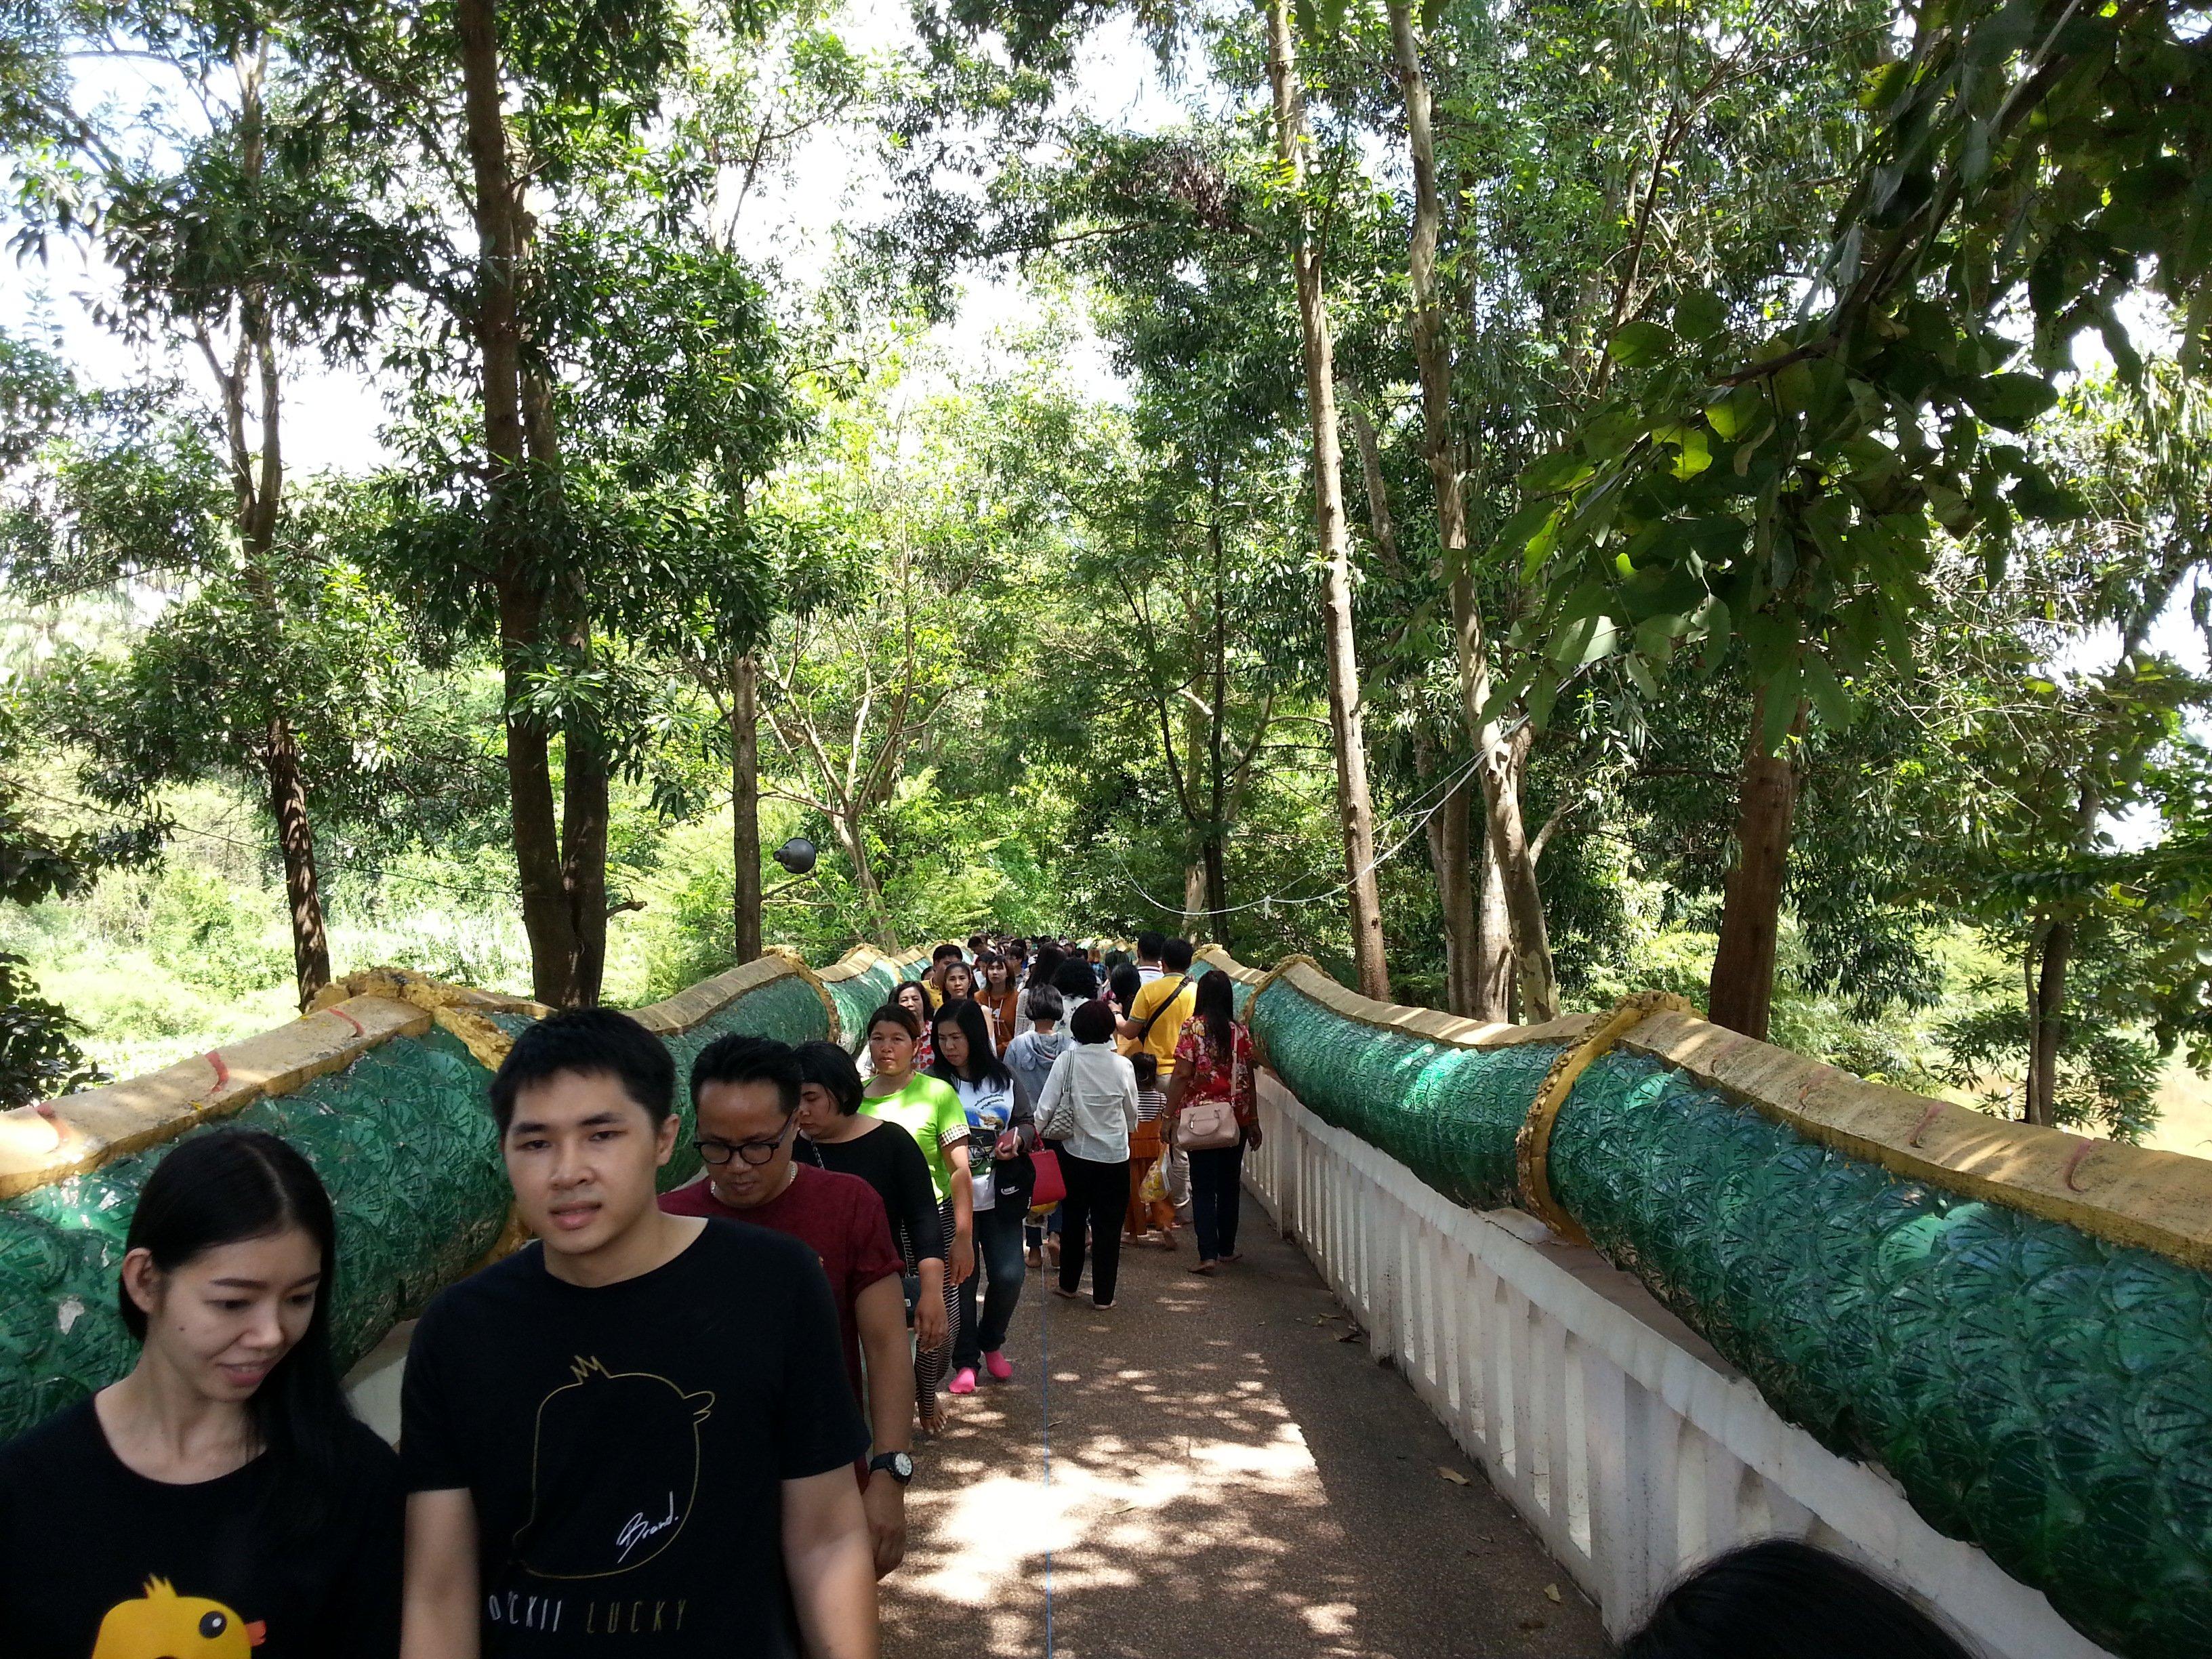 Naga bridge to Wat Kham Chanot Forest